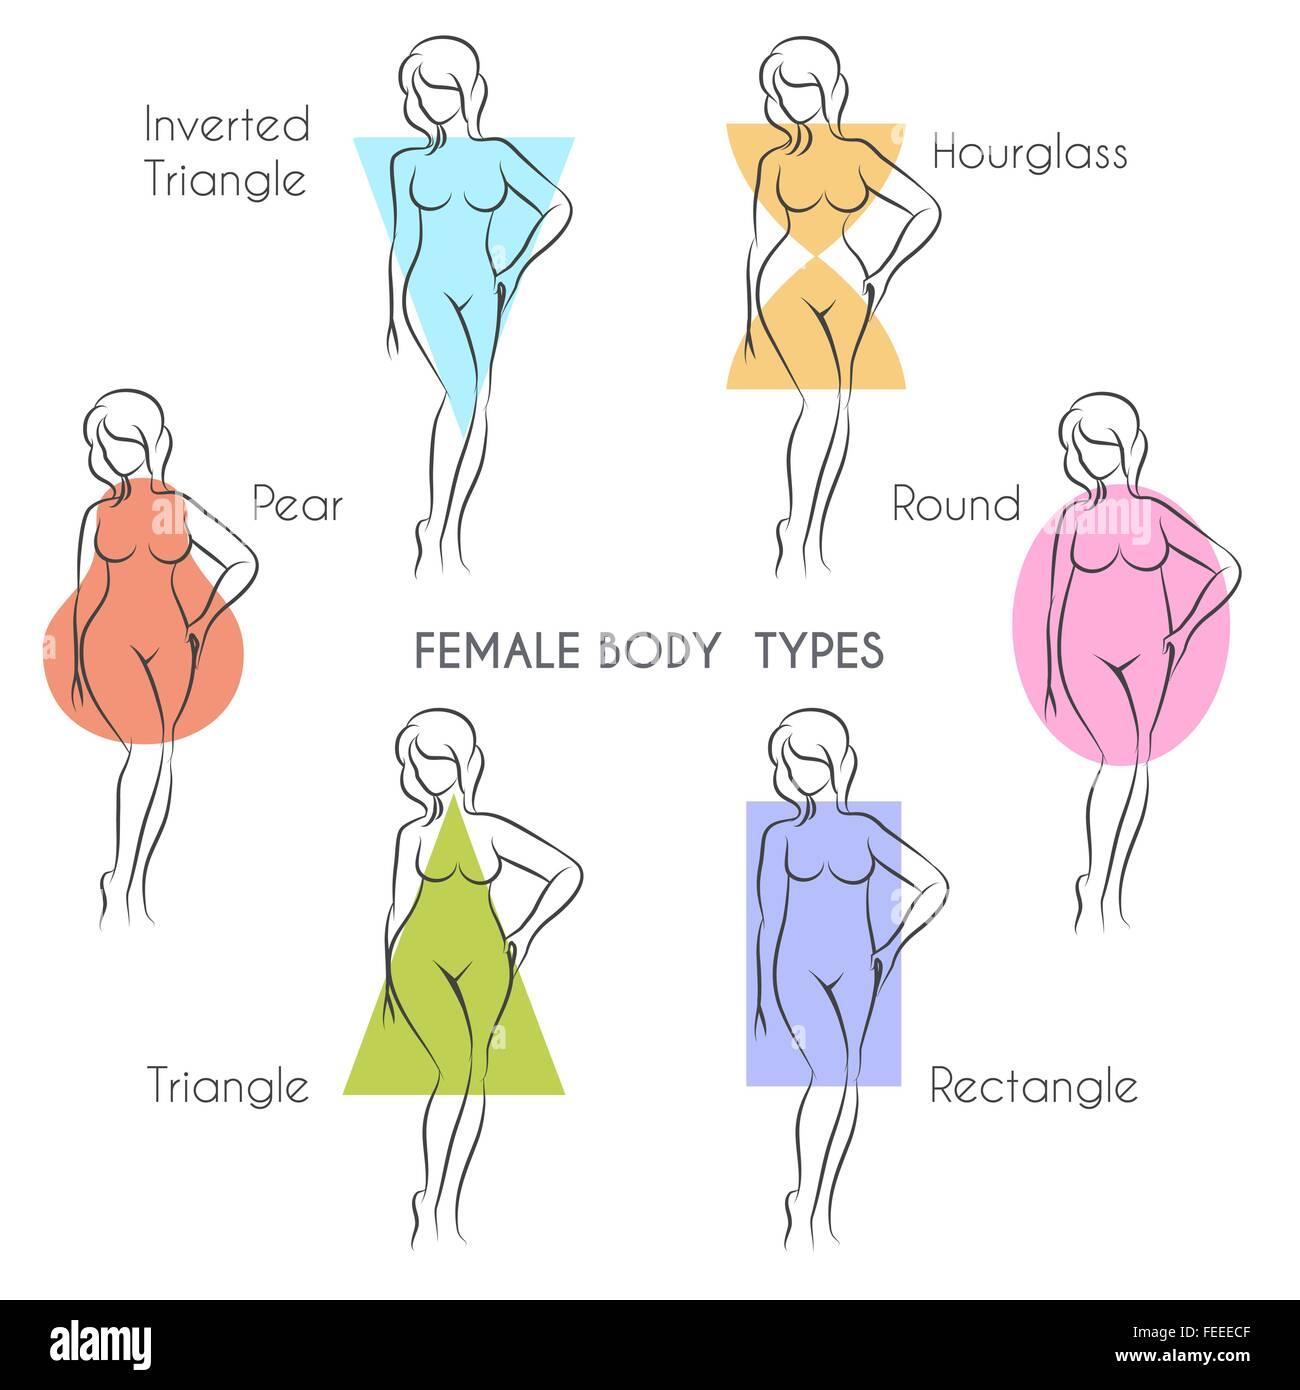 Female body types anatomy. Main woman figure shape, free font used ...